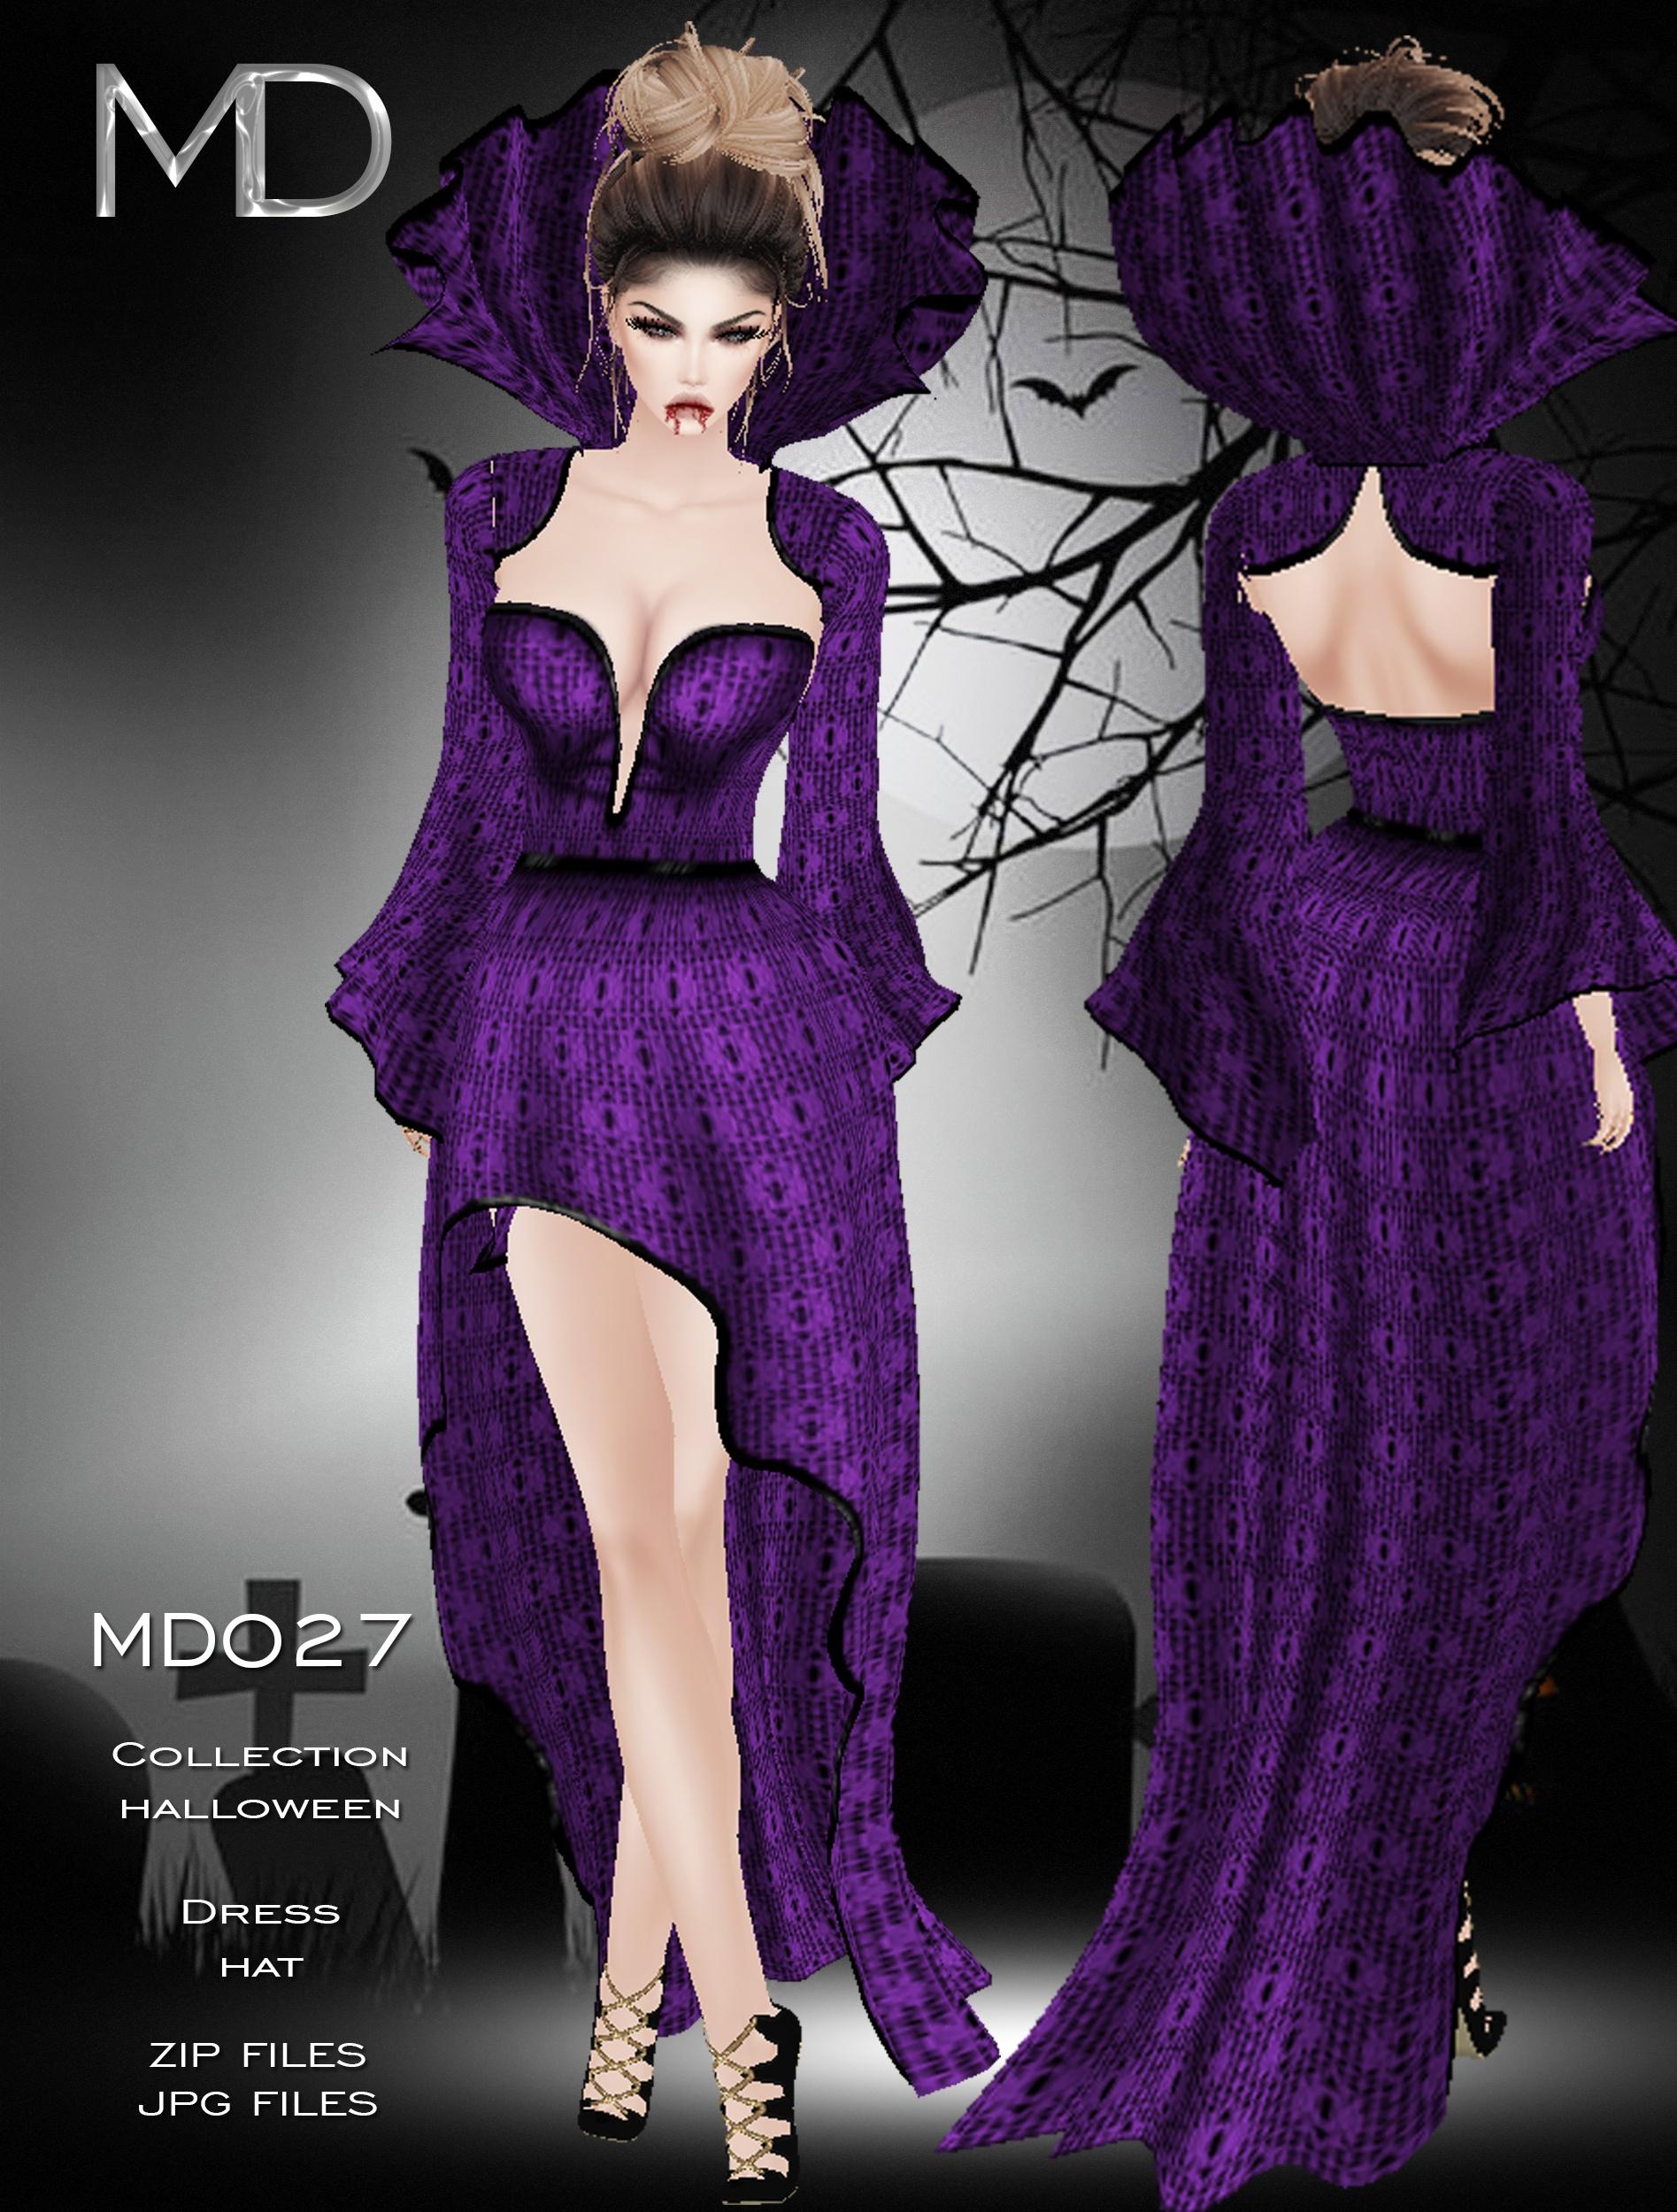 MD027 - Texture - Halloween